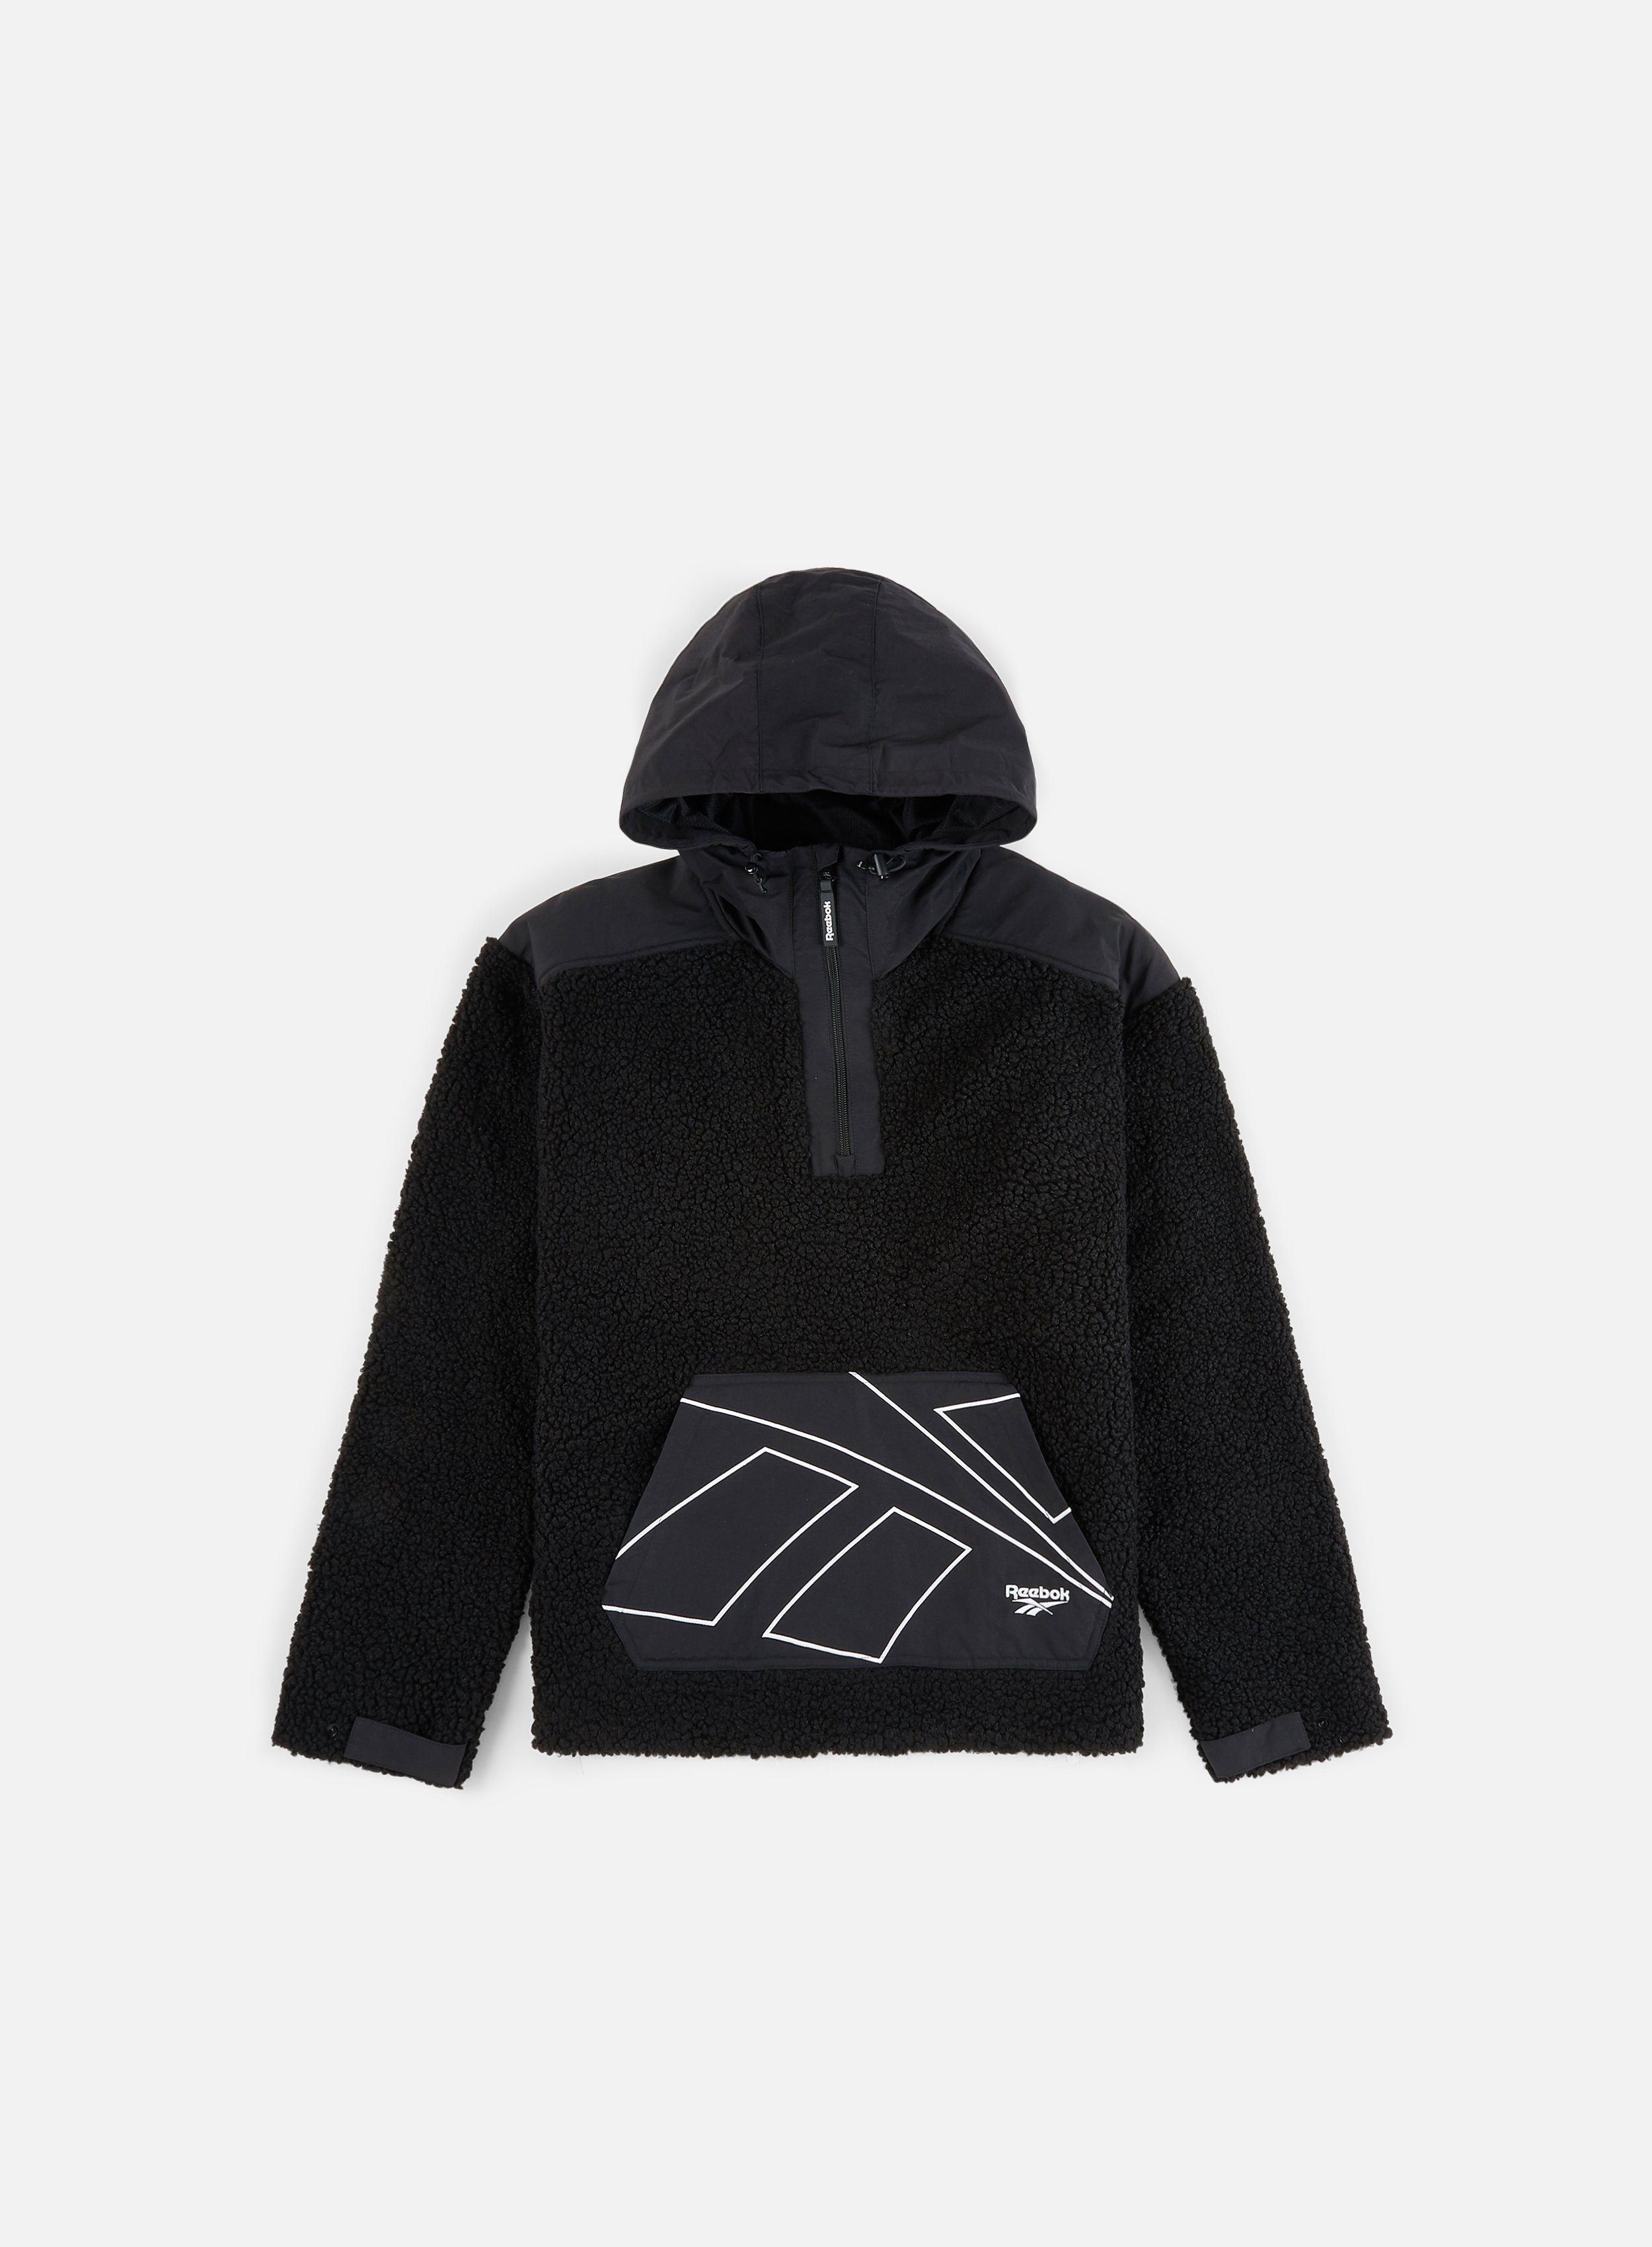 Reebok Classic Half-zip sweatshirt mens long sweatshirt black.